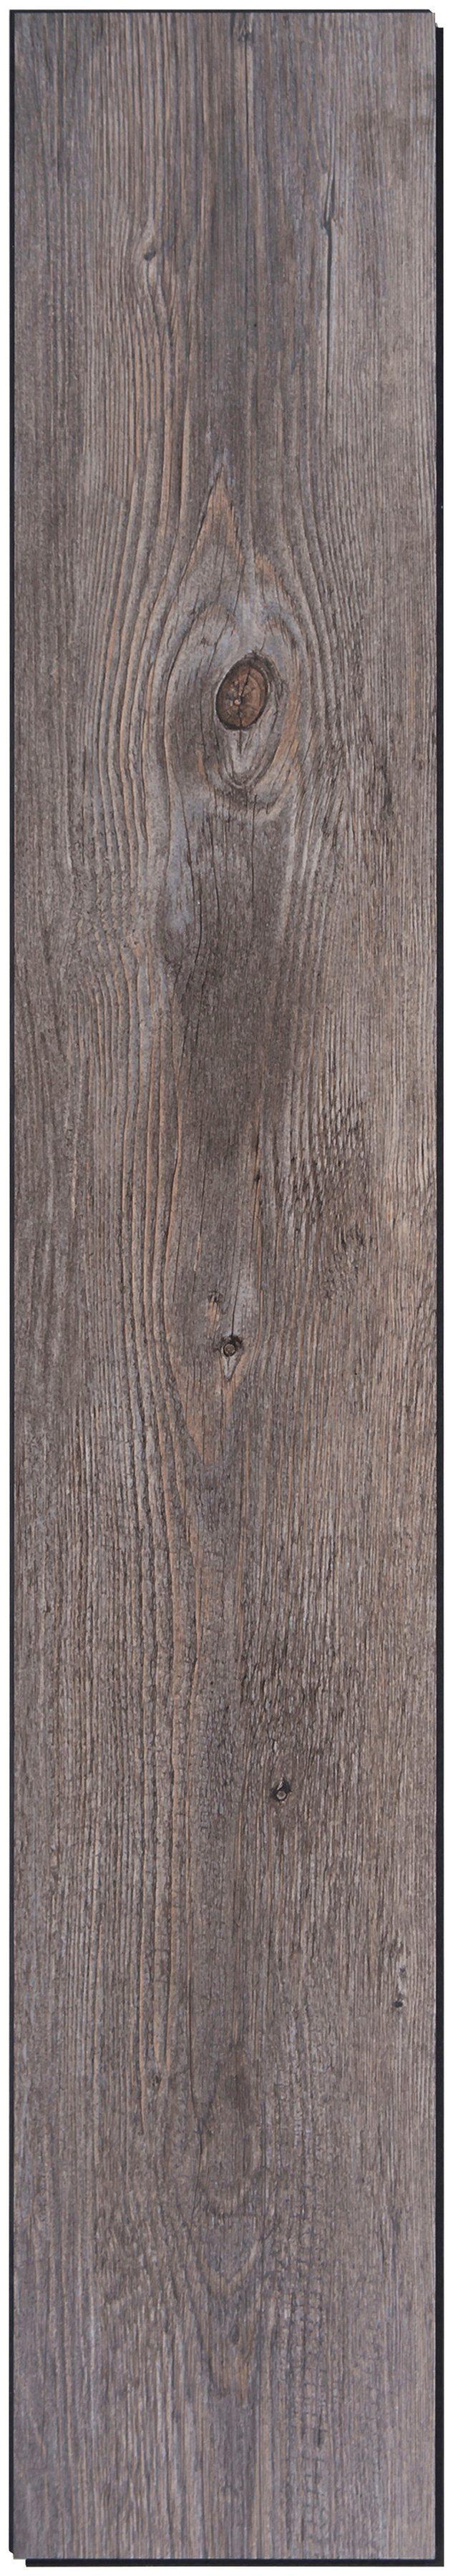 PVC-Boden »PVC-Planke 3,2 mm«, Klick-Verbindung